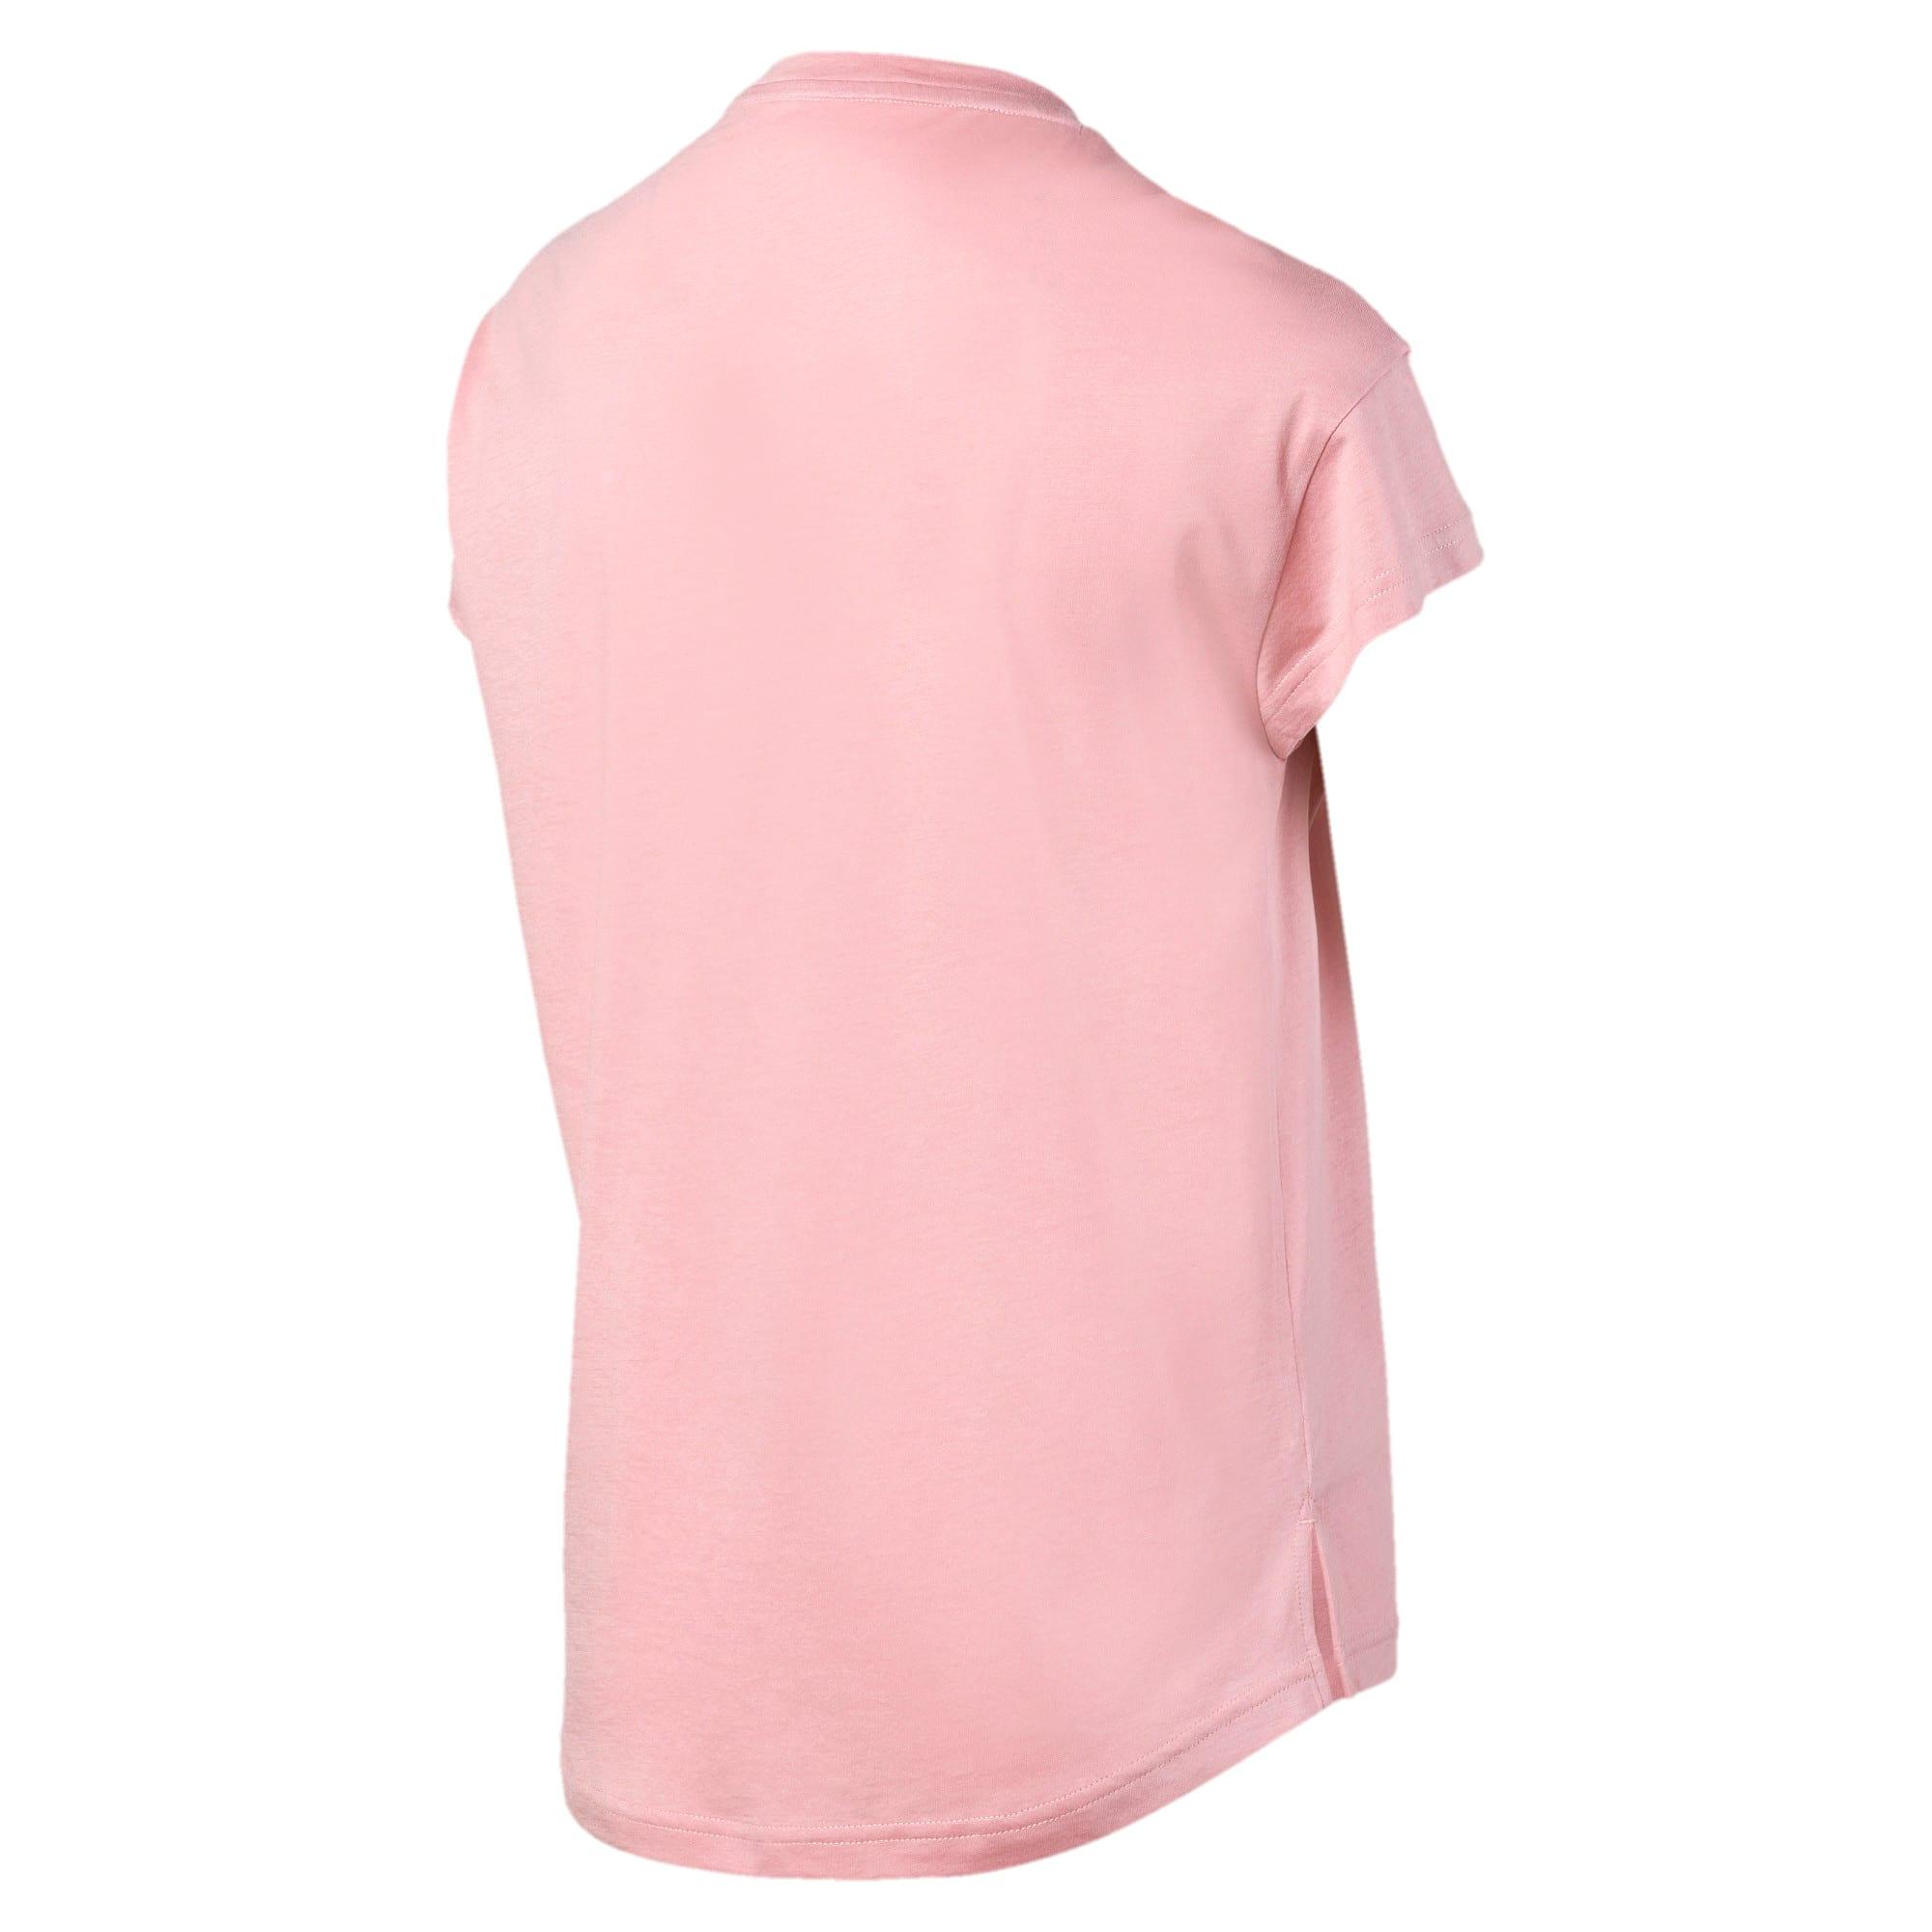 Miniatura 5 de Camiseta estampadaModernSports de mujer, Bridal Rose, mediano